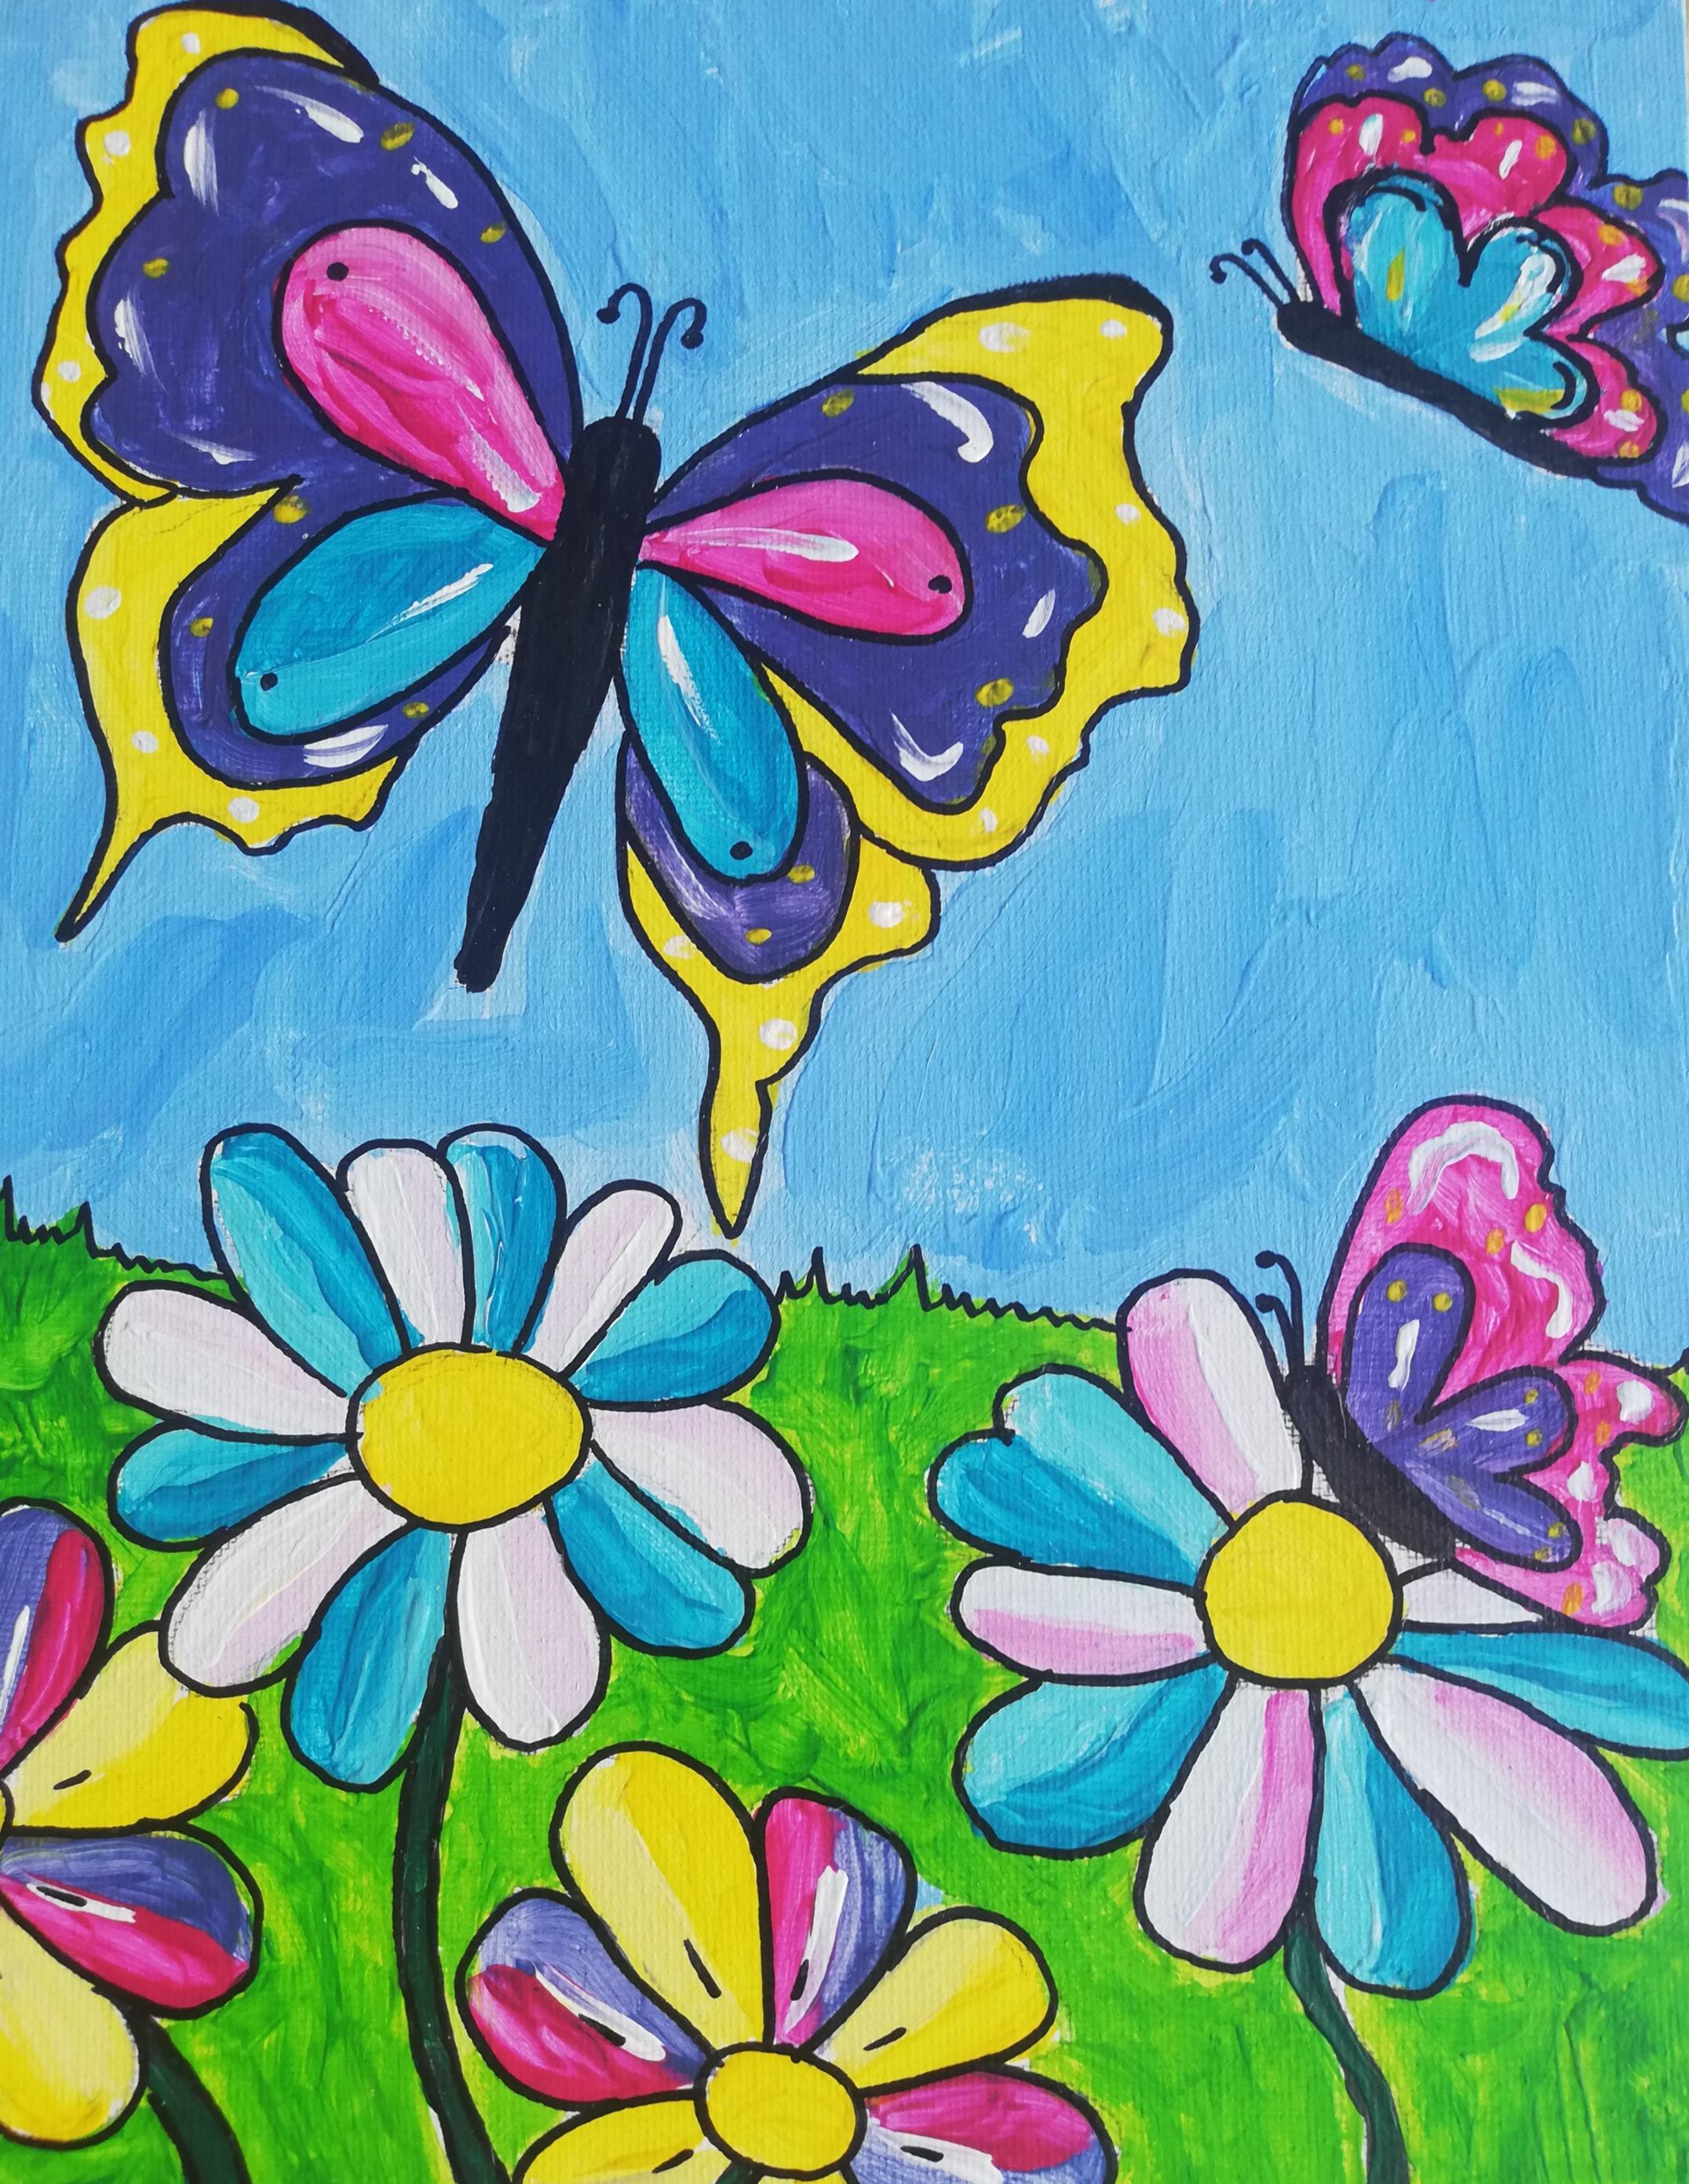 dikke dames vrolijke dieren vlinders